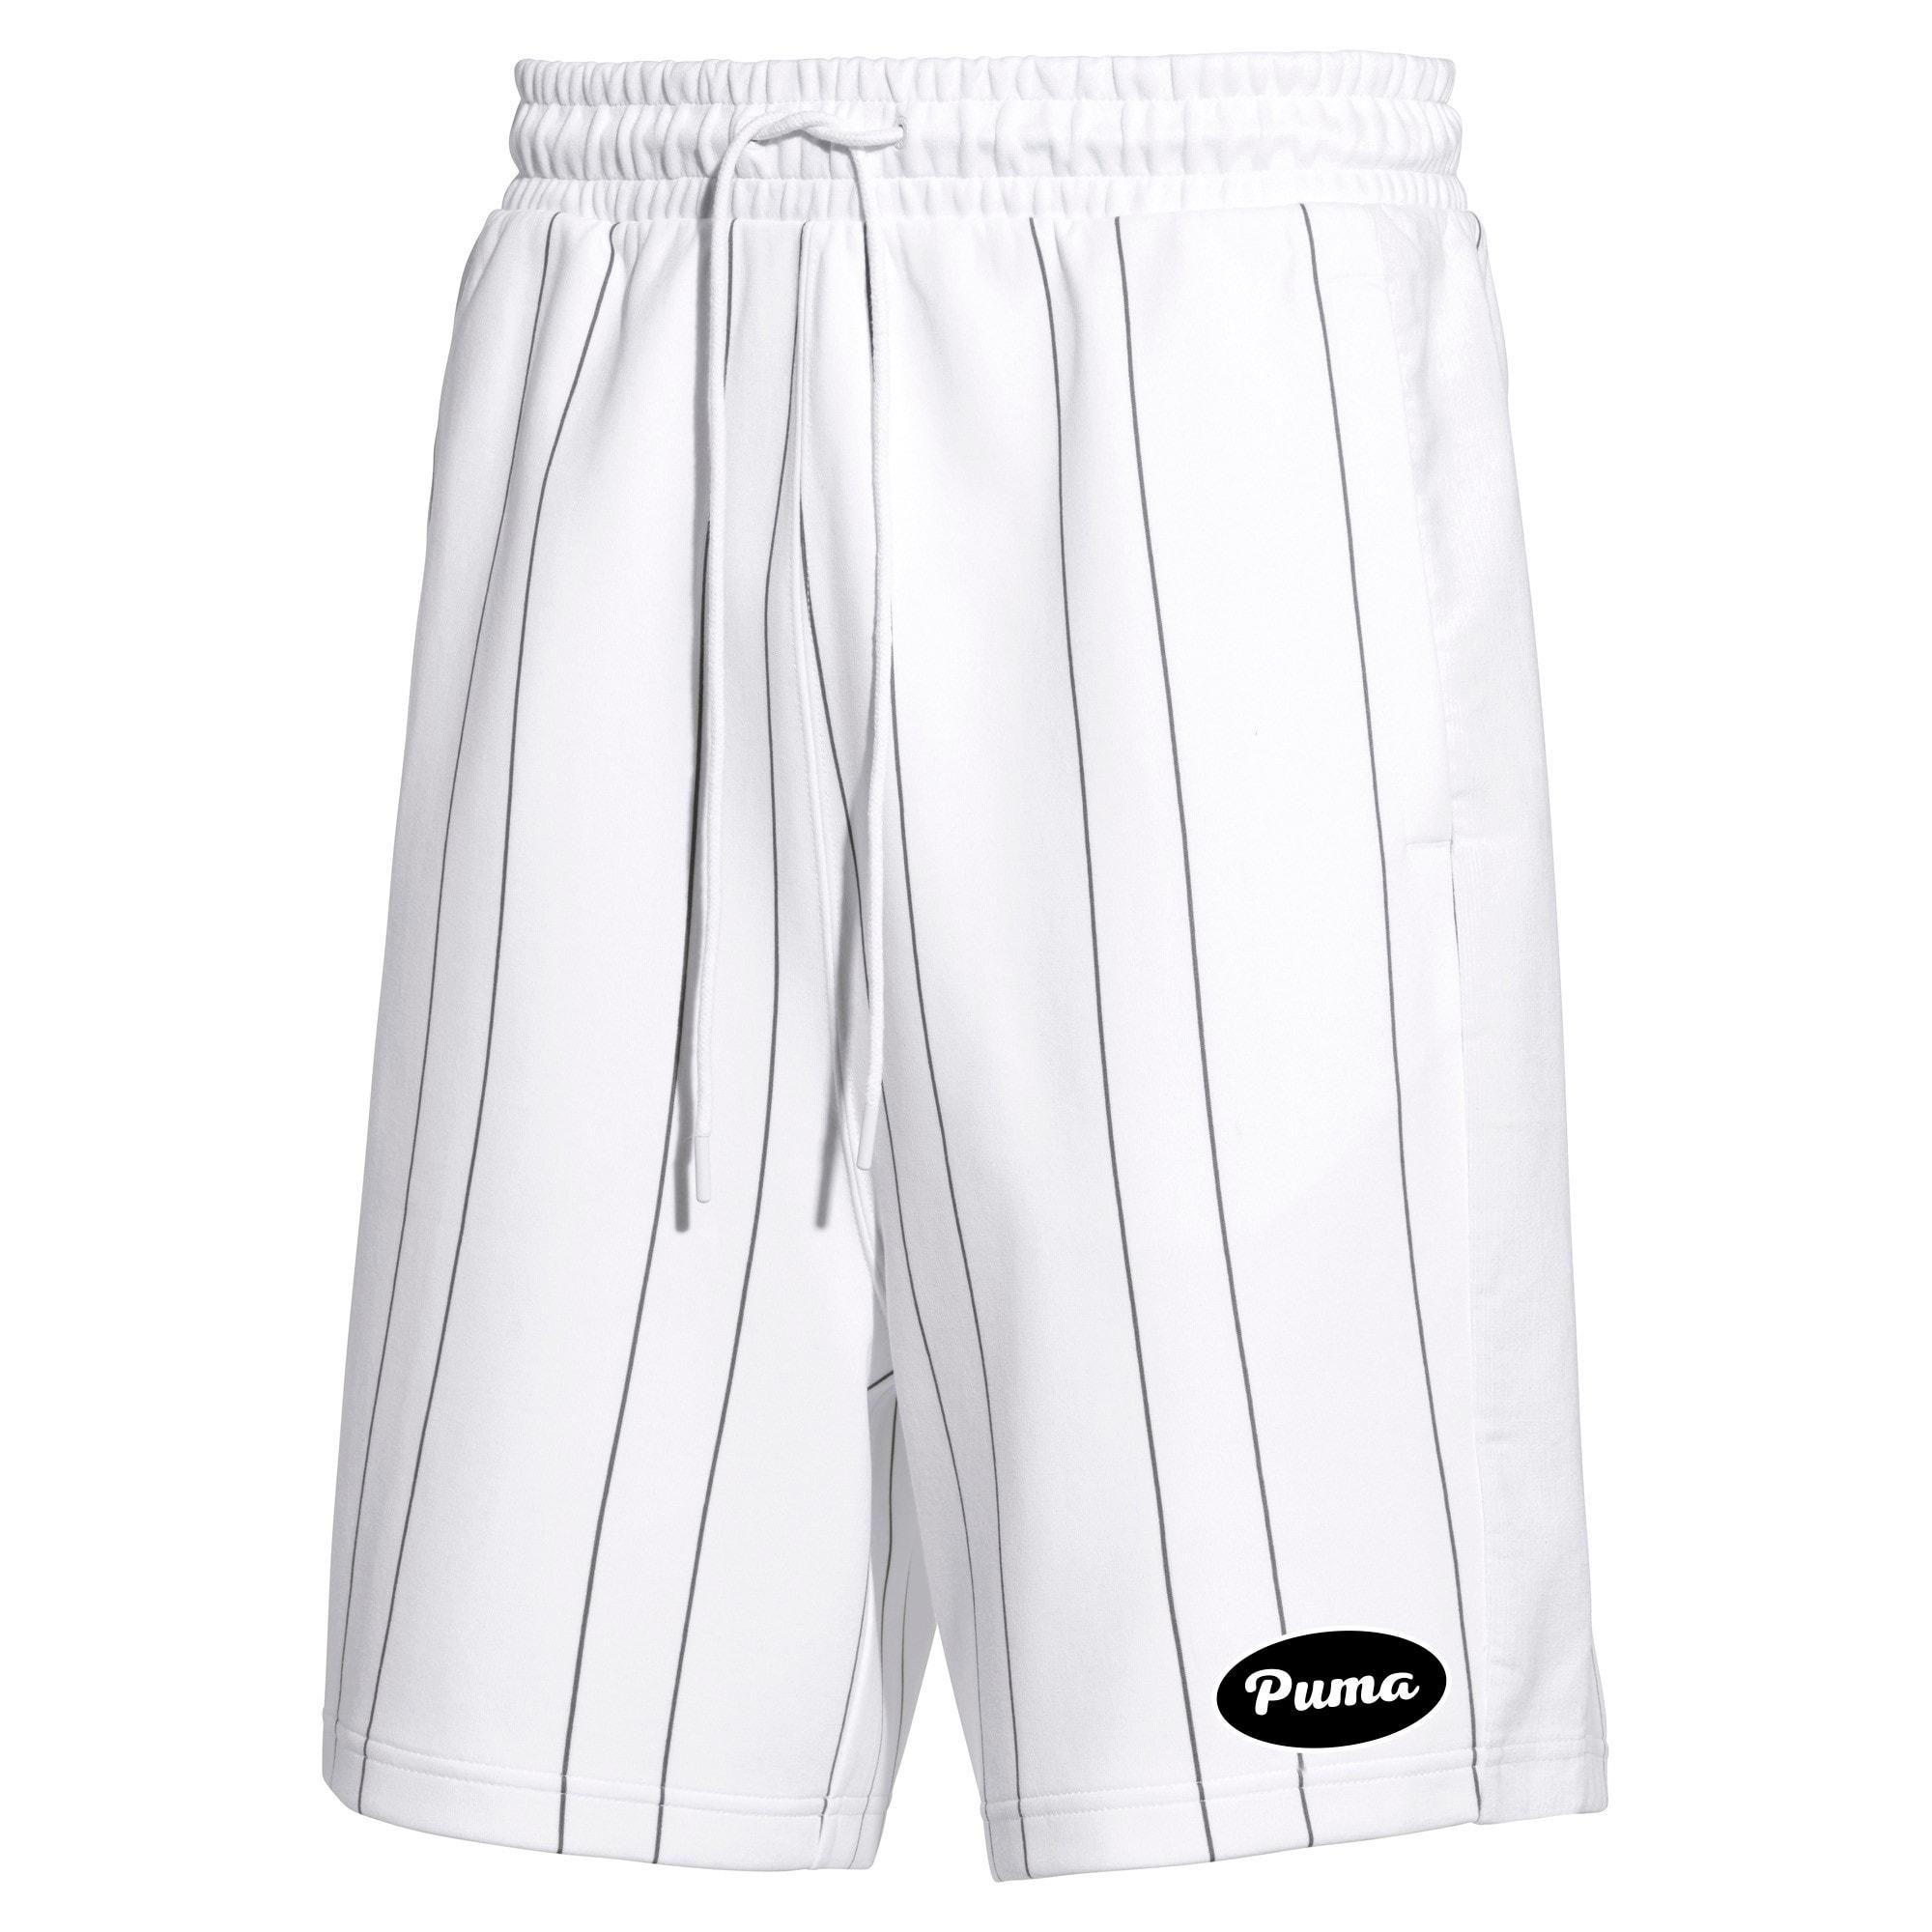 Thumbnail 1 of PUMA 91074 Men's Striped Shorts, Puma White--AOP, medium